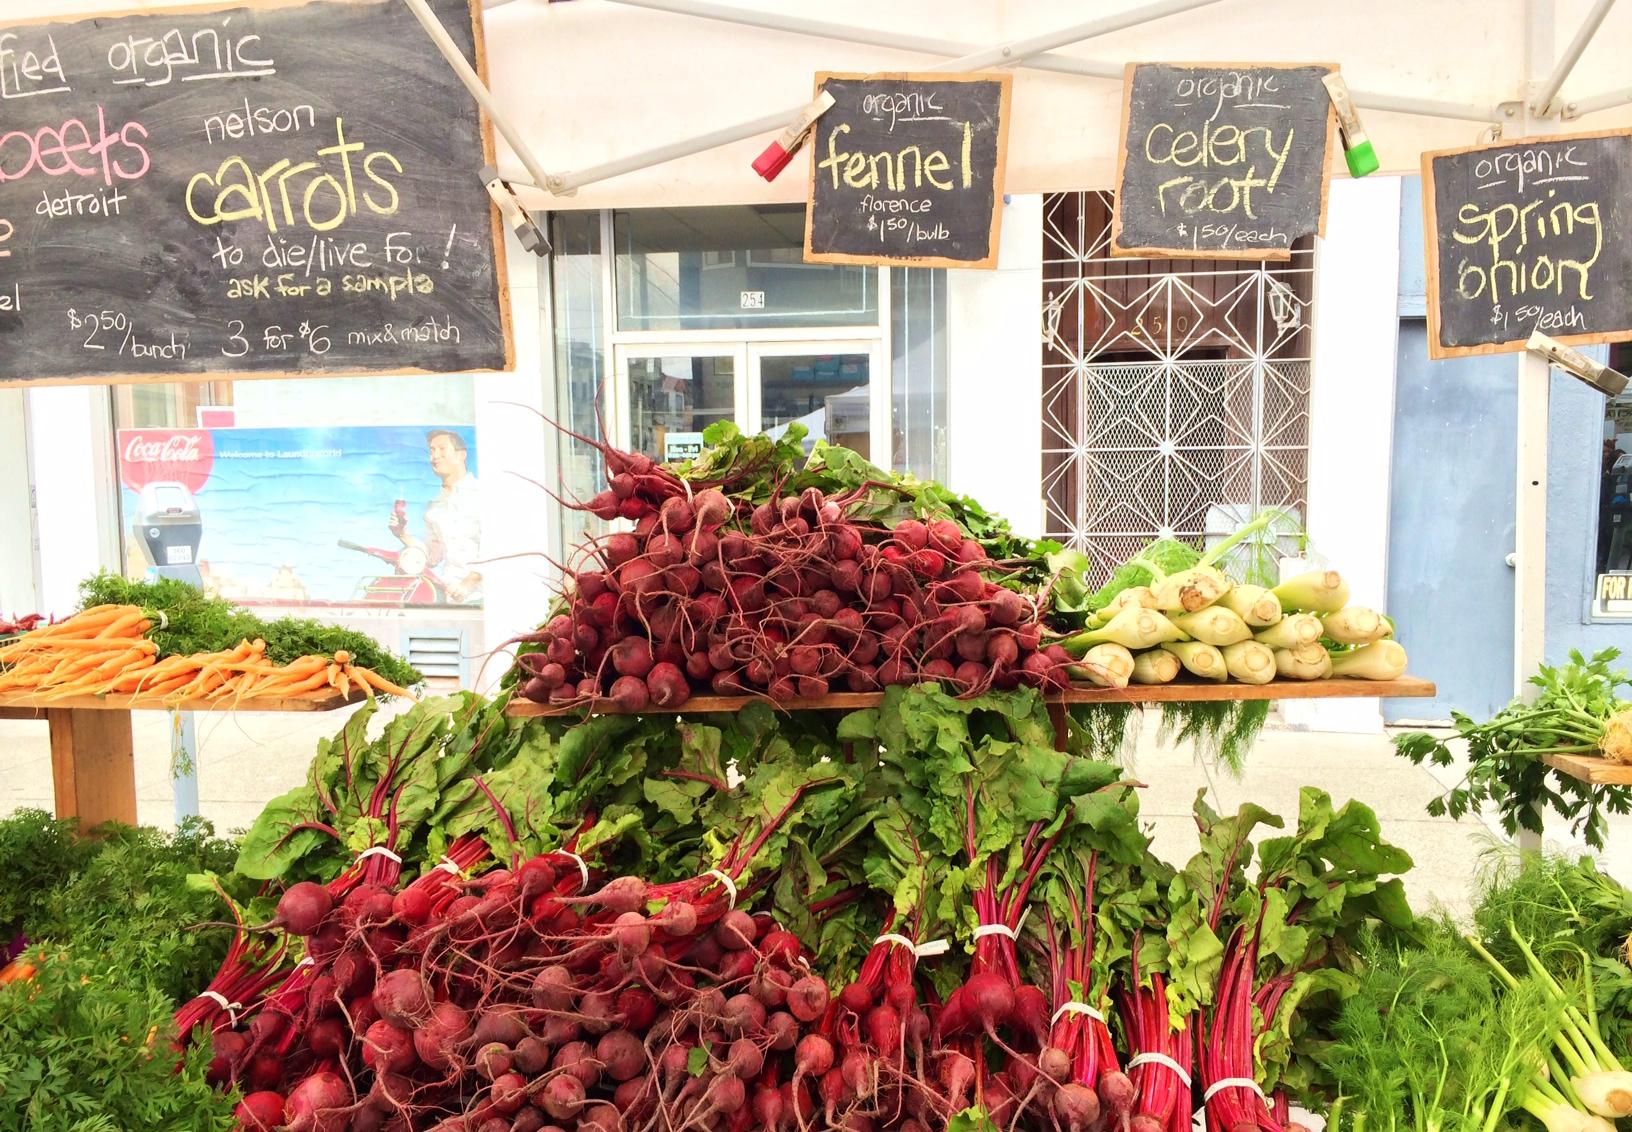 2-Chili-Infused-Chickpea-Salad | www.8thandlake.com